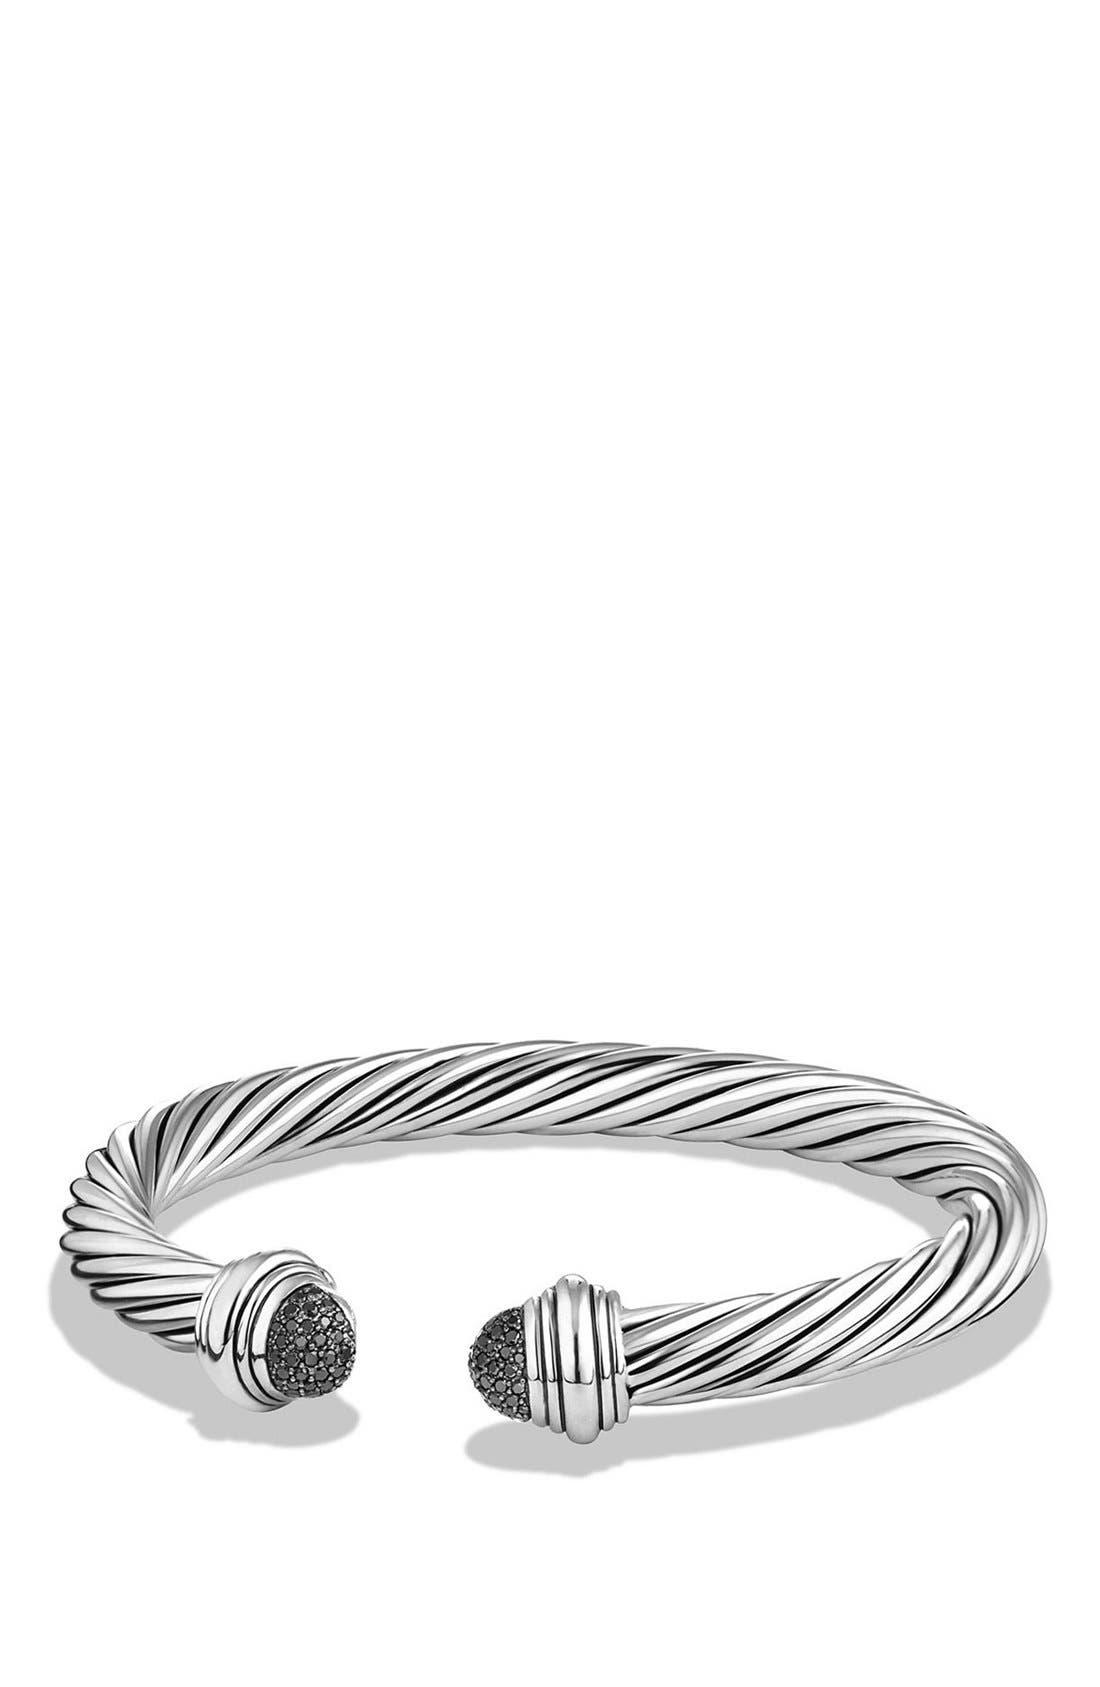 Main Image - David Yurman 'Cable Classics' Bracelet with Black Diamonds